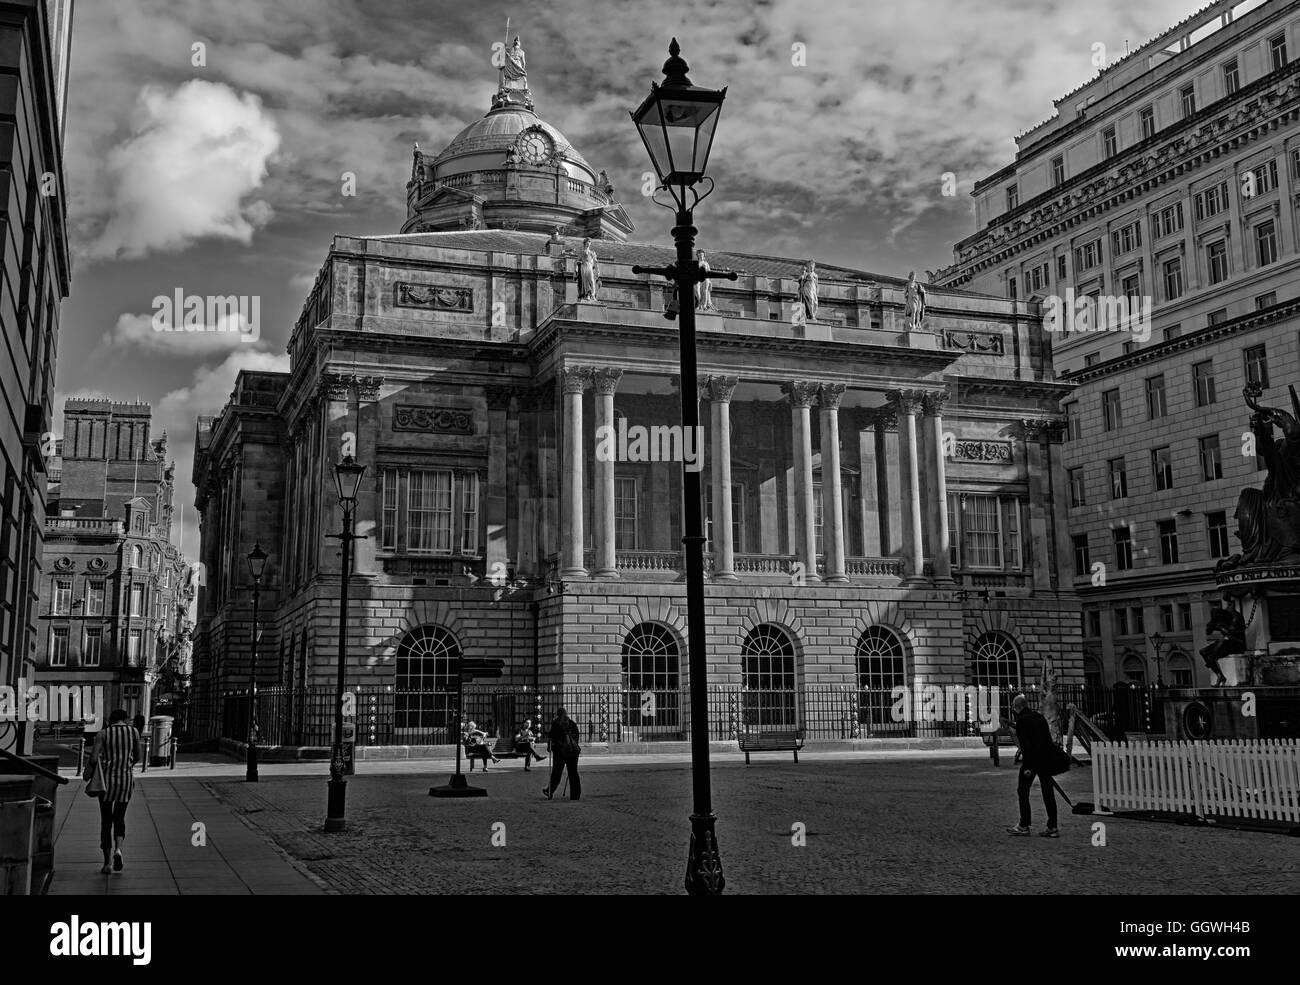 Liverpool Town Hall, Dale St,Merseyside,England,UK - Mono - Stock Image